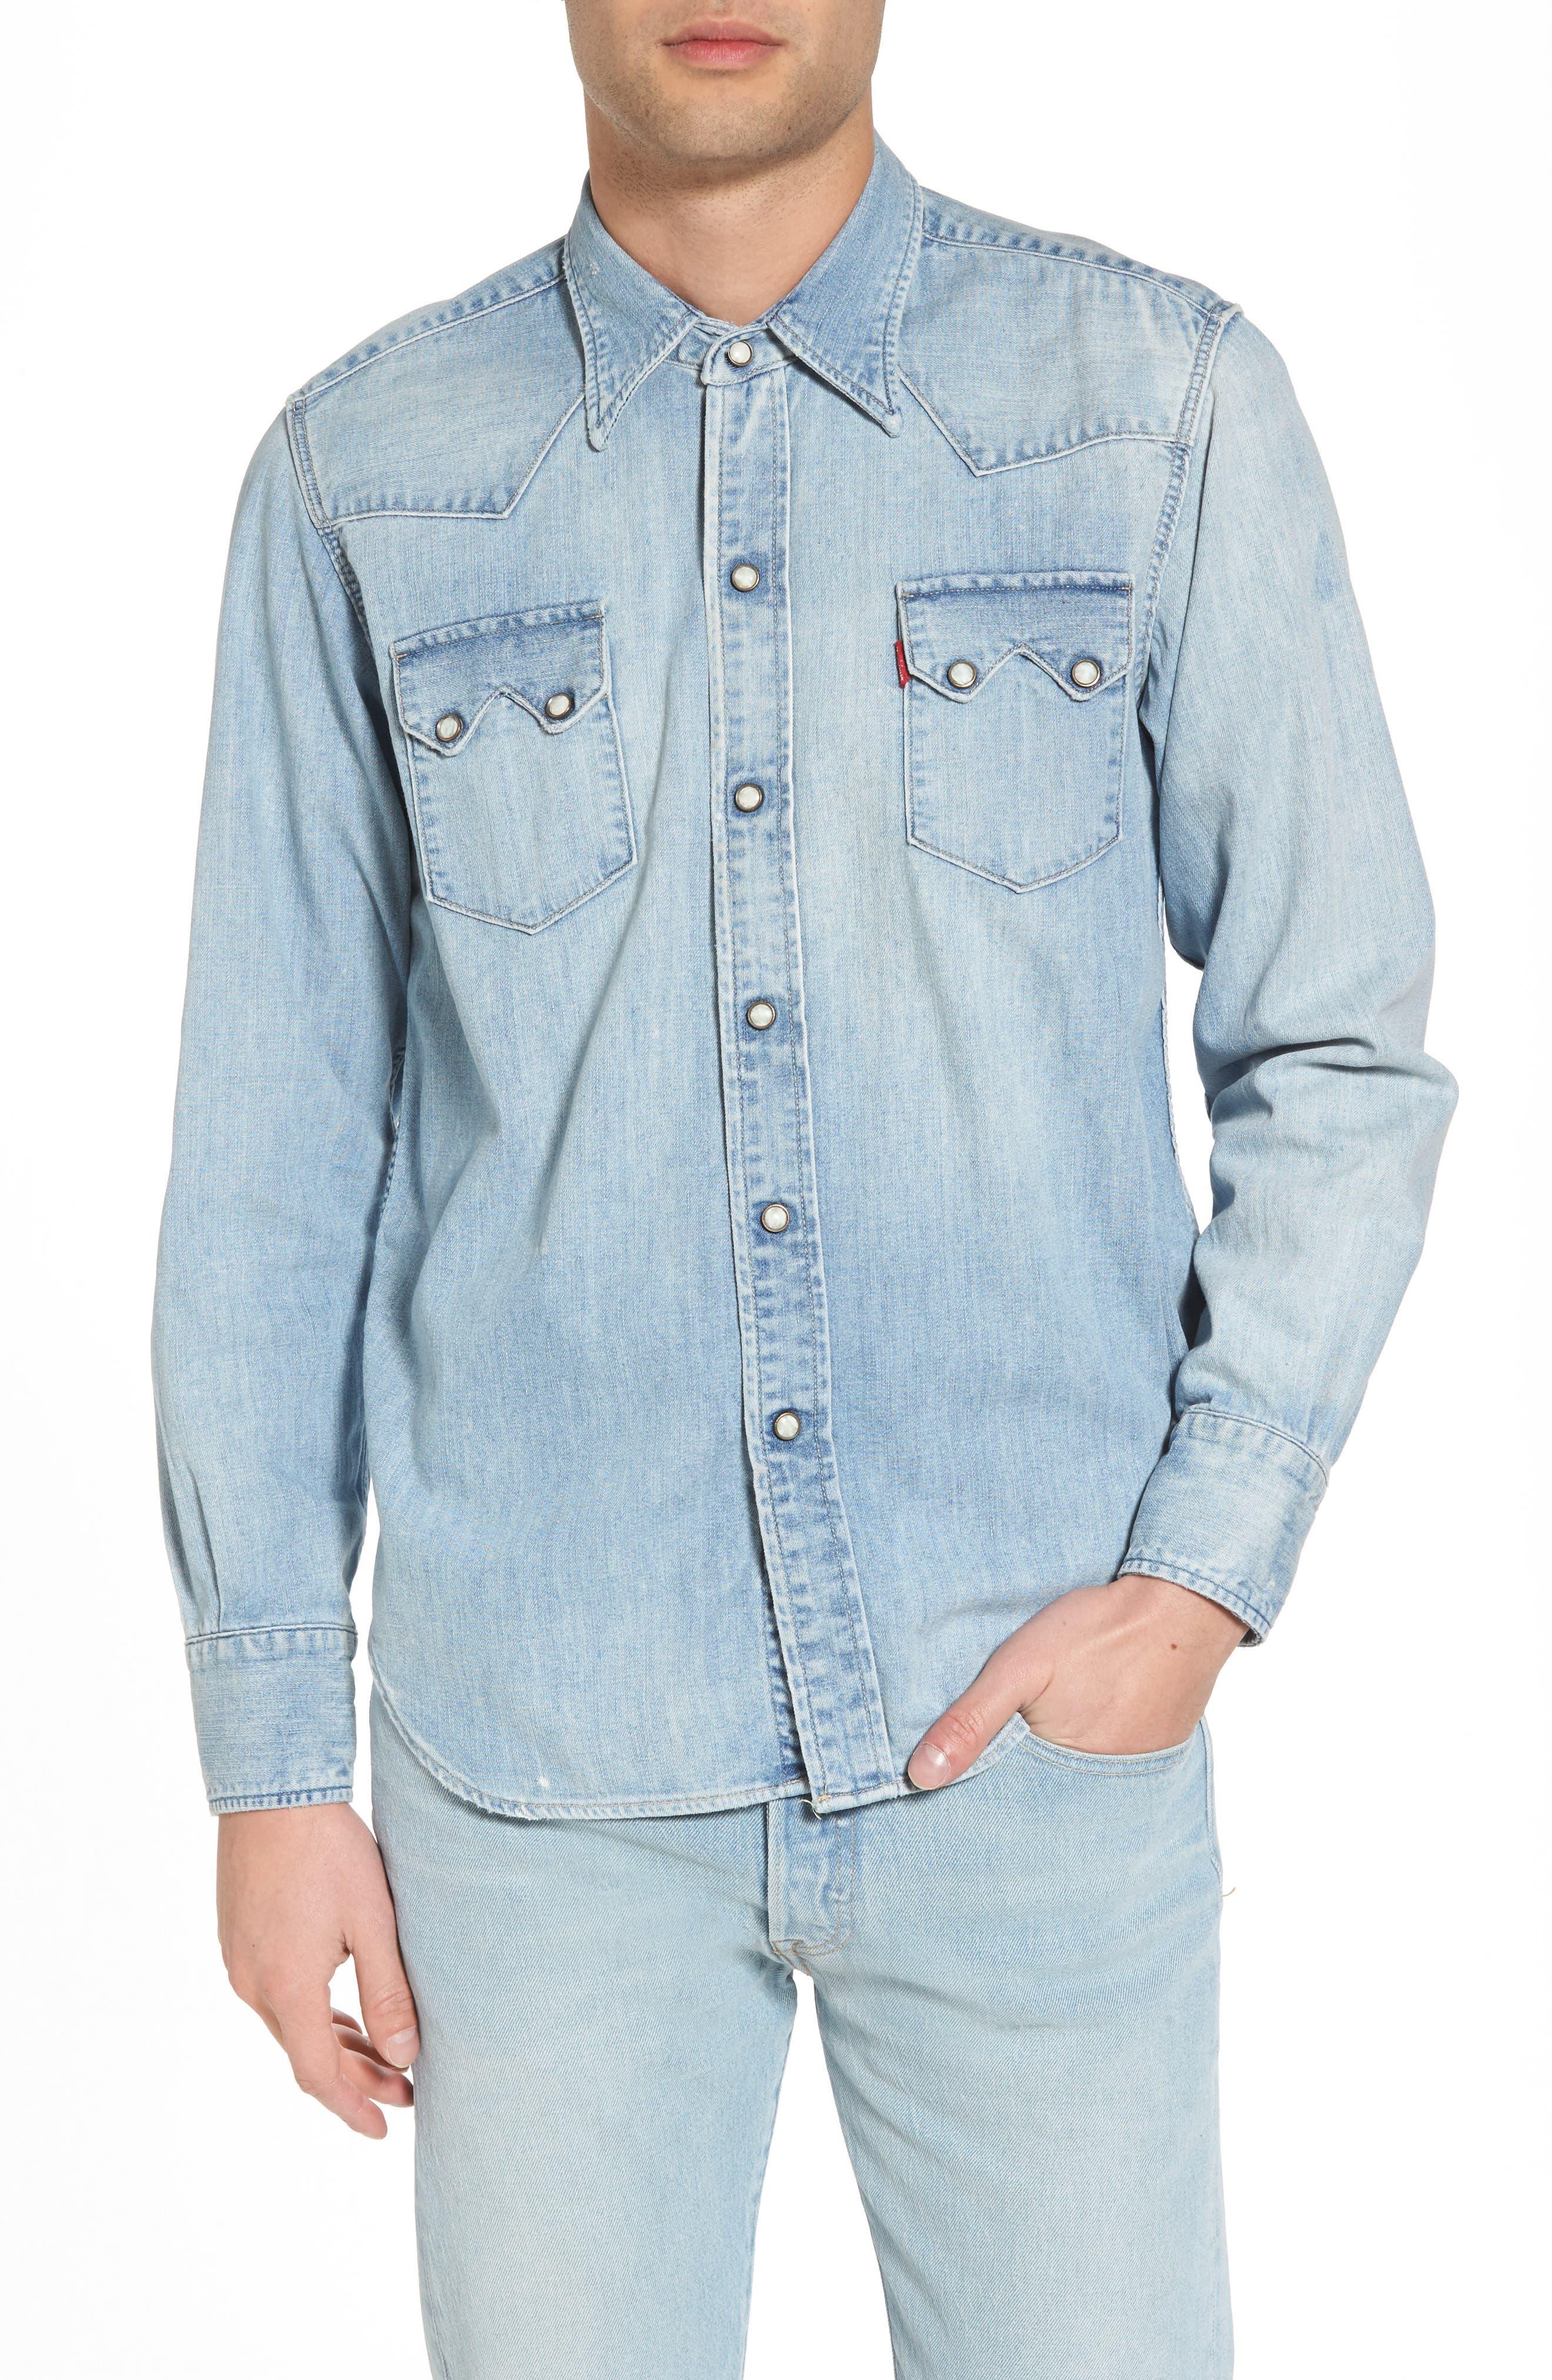 1955 Sawtooth Trim Fit Denim Western Shirt,                         Main,                         color, Blue